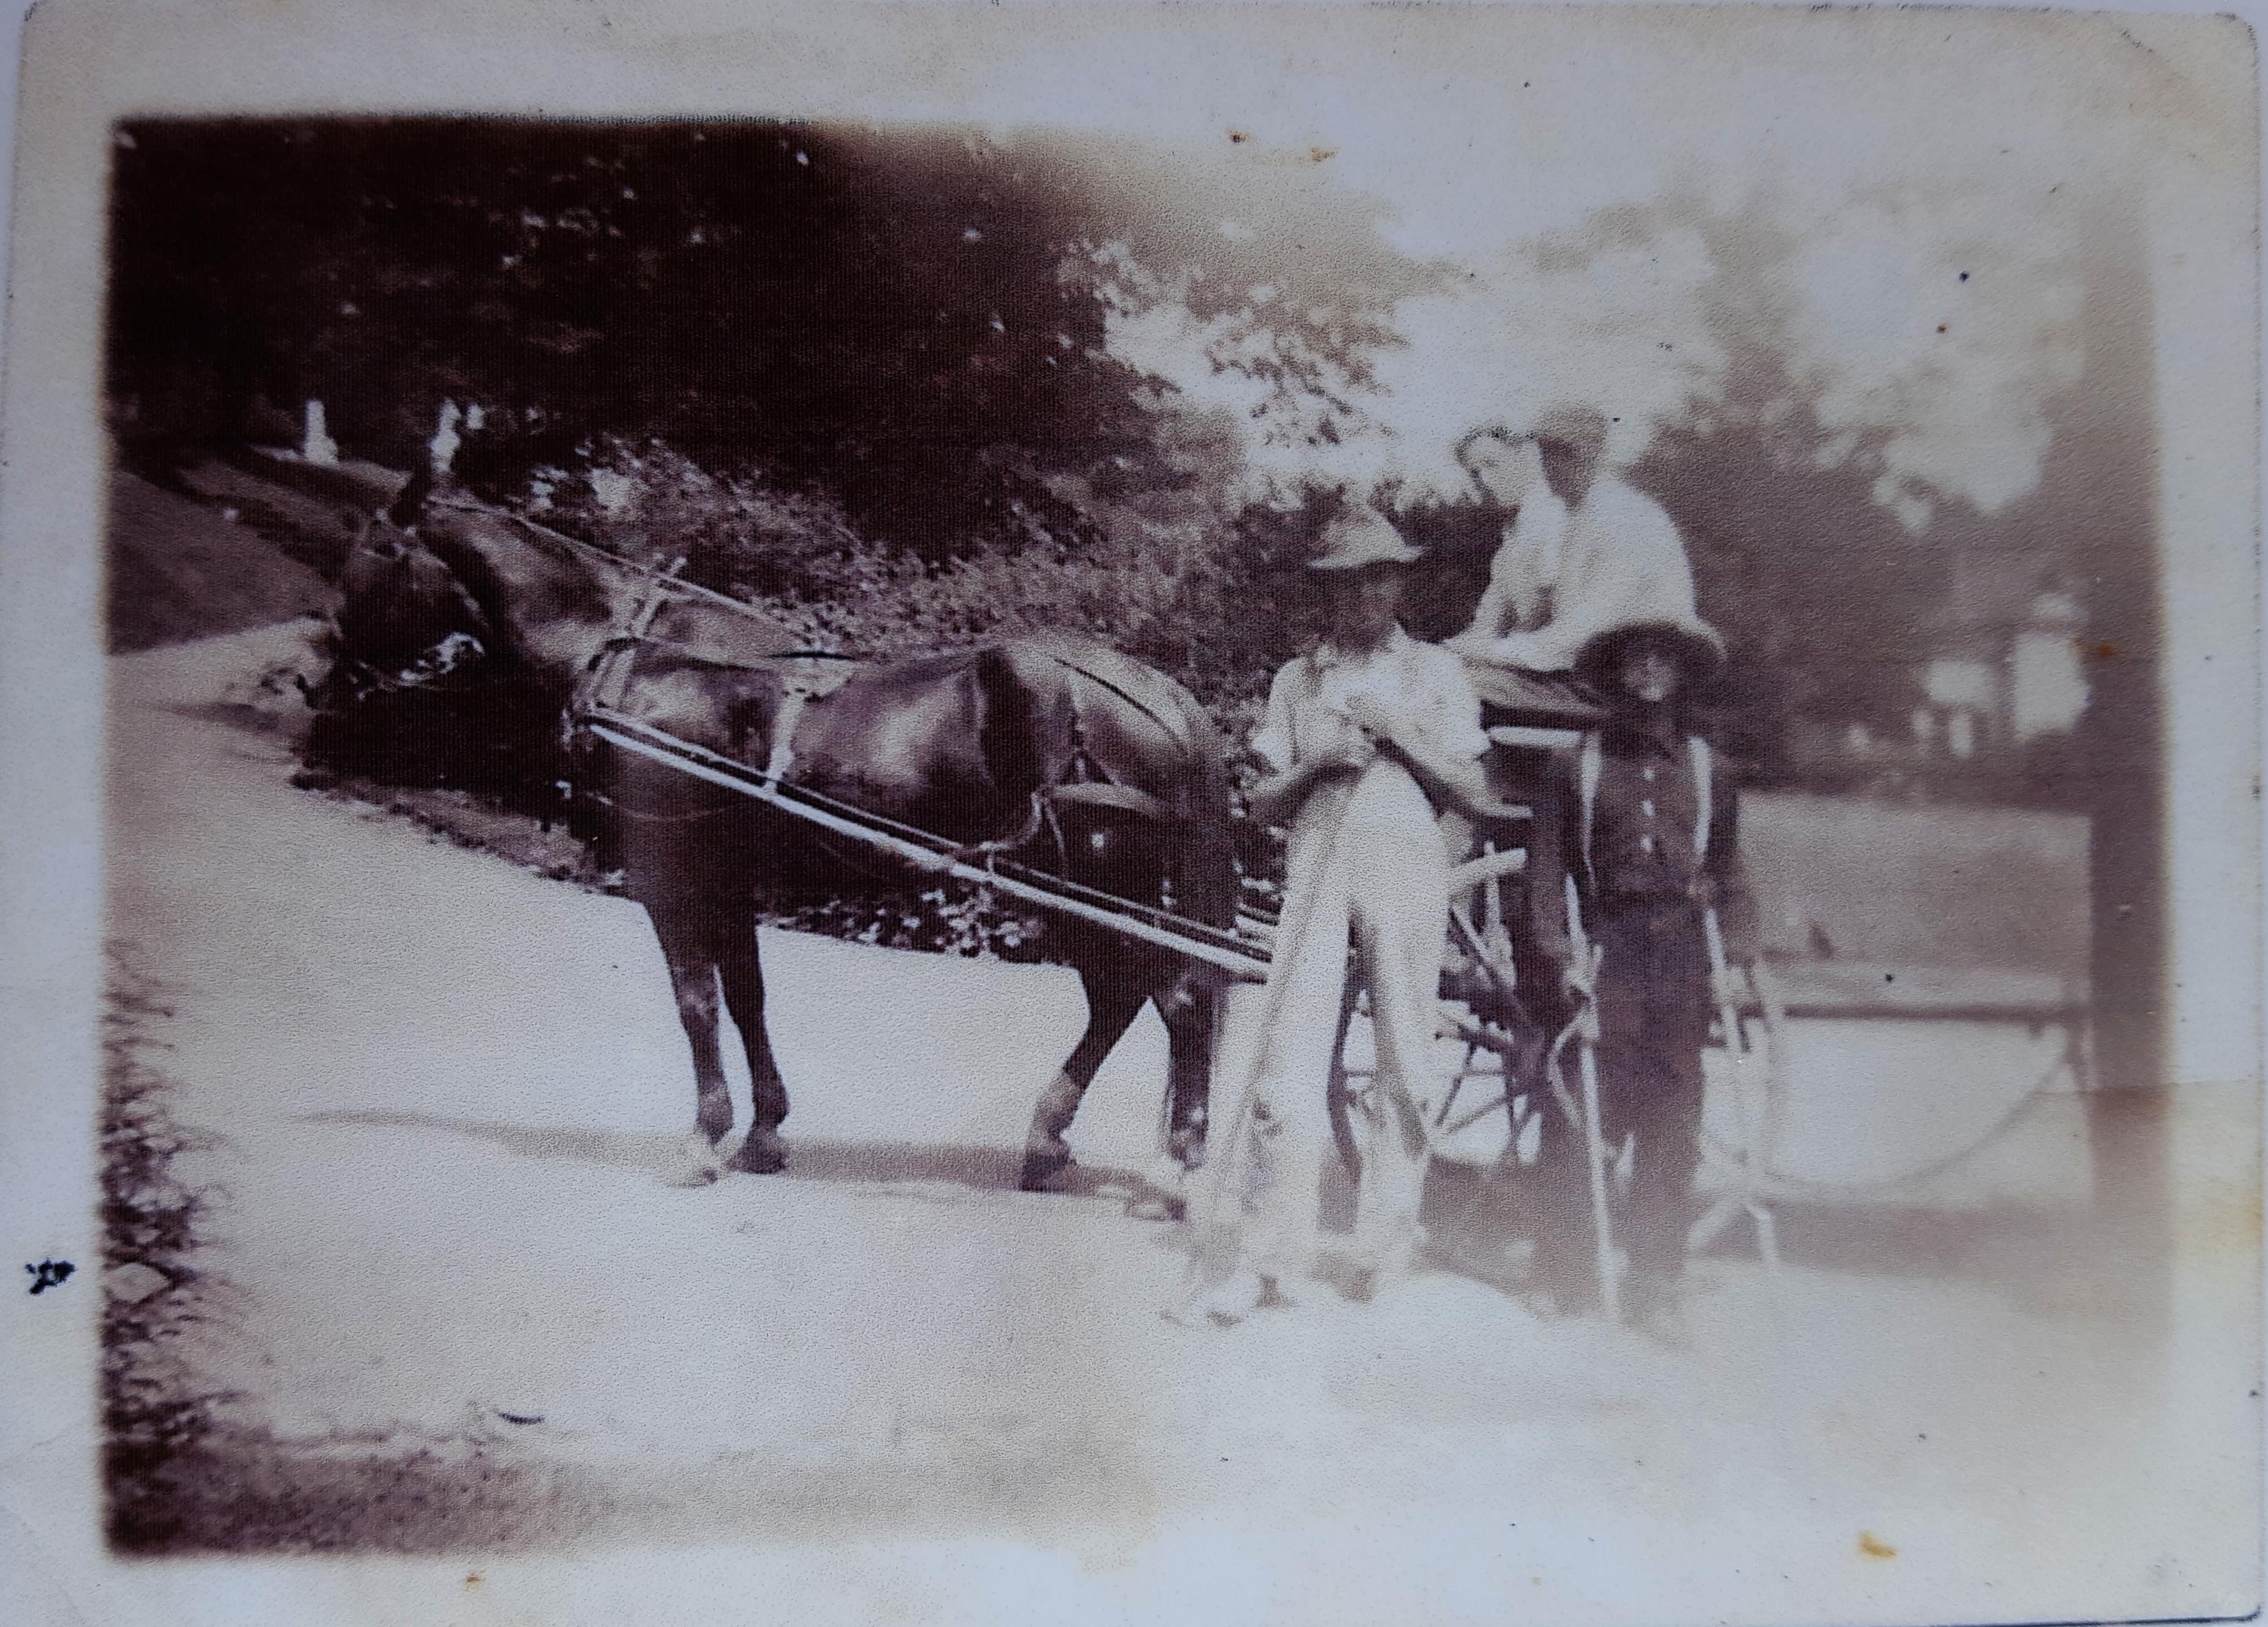 Horse-powered burial crew (circa 1920)